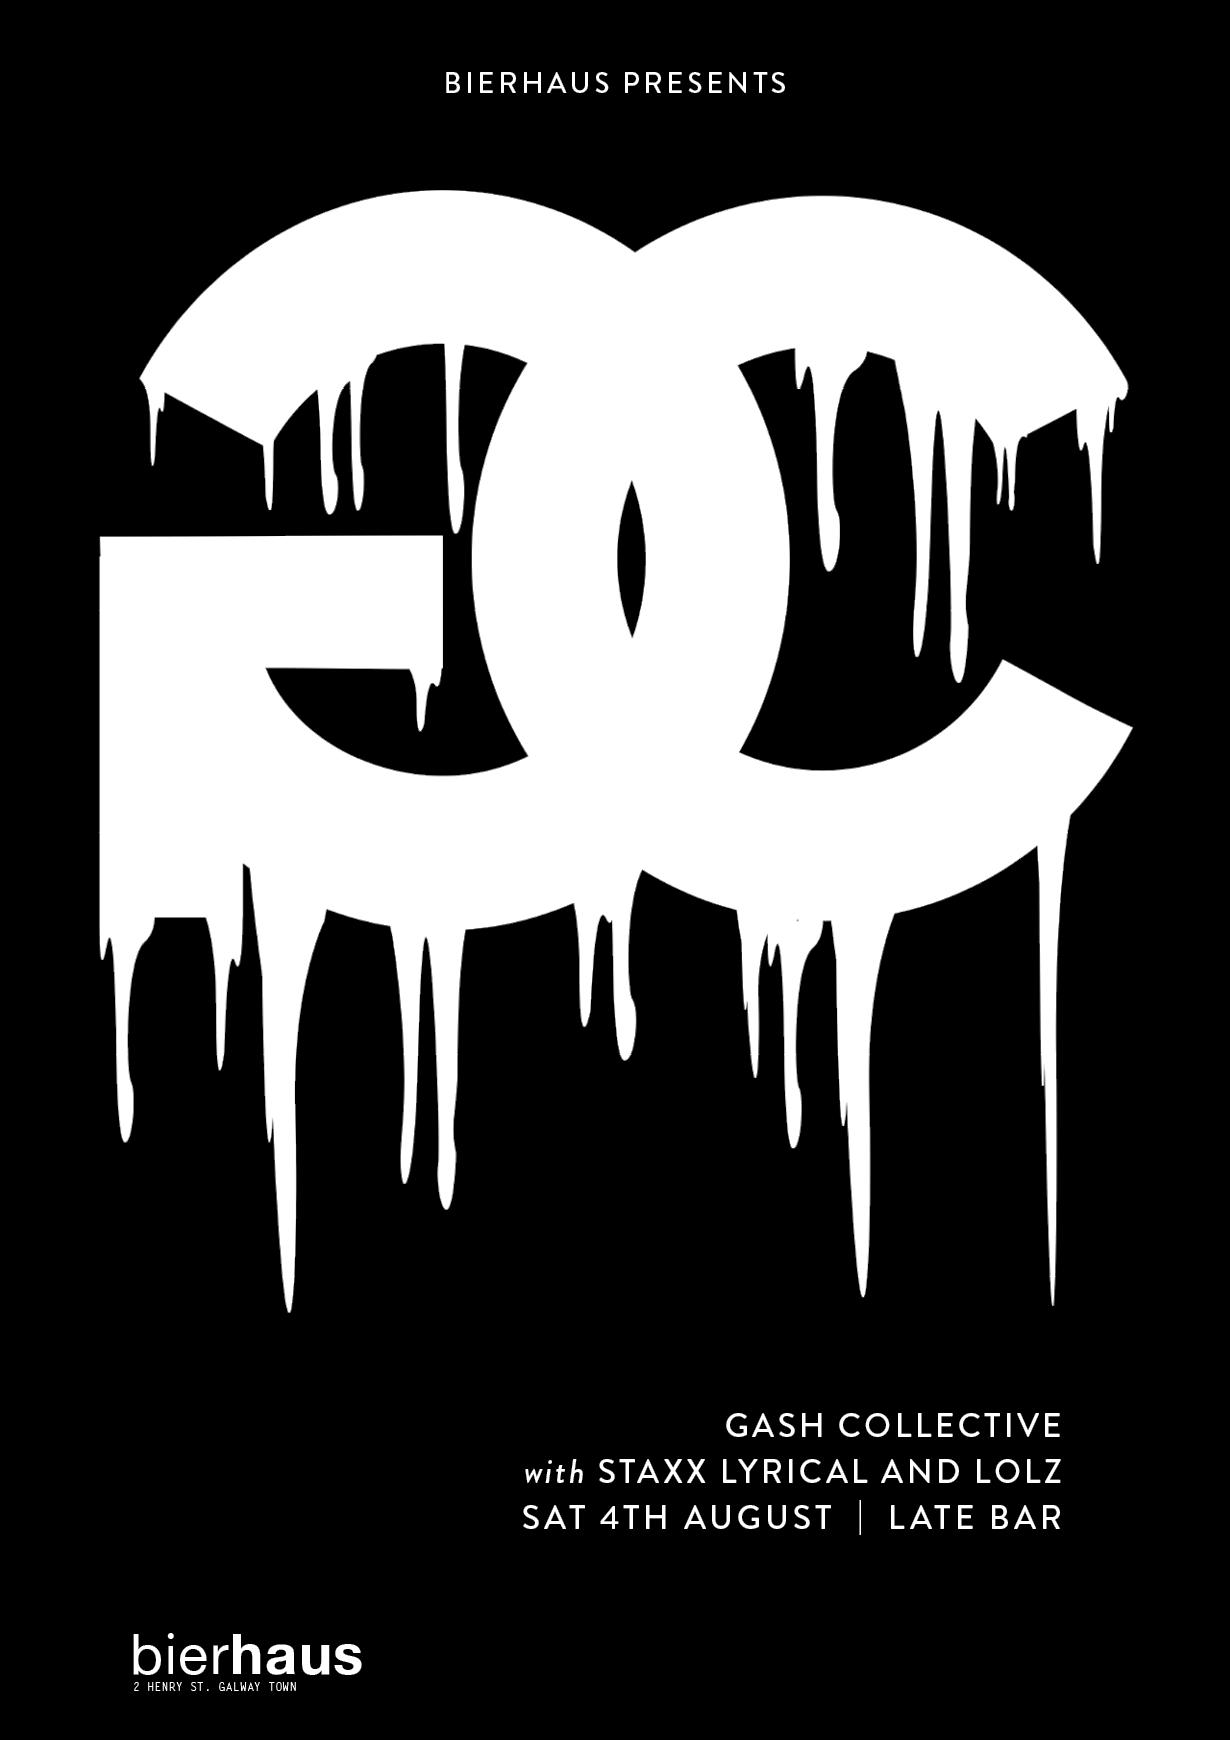 Bierhaus-Galway-Gash-Collective